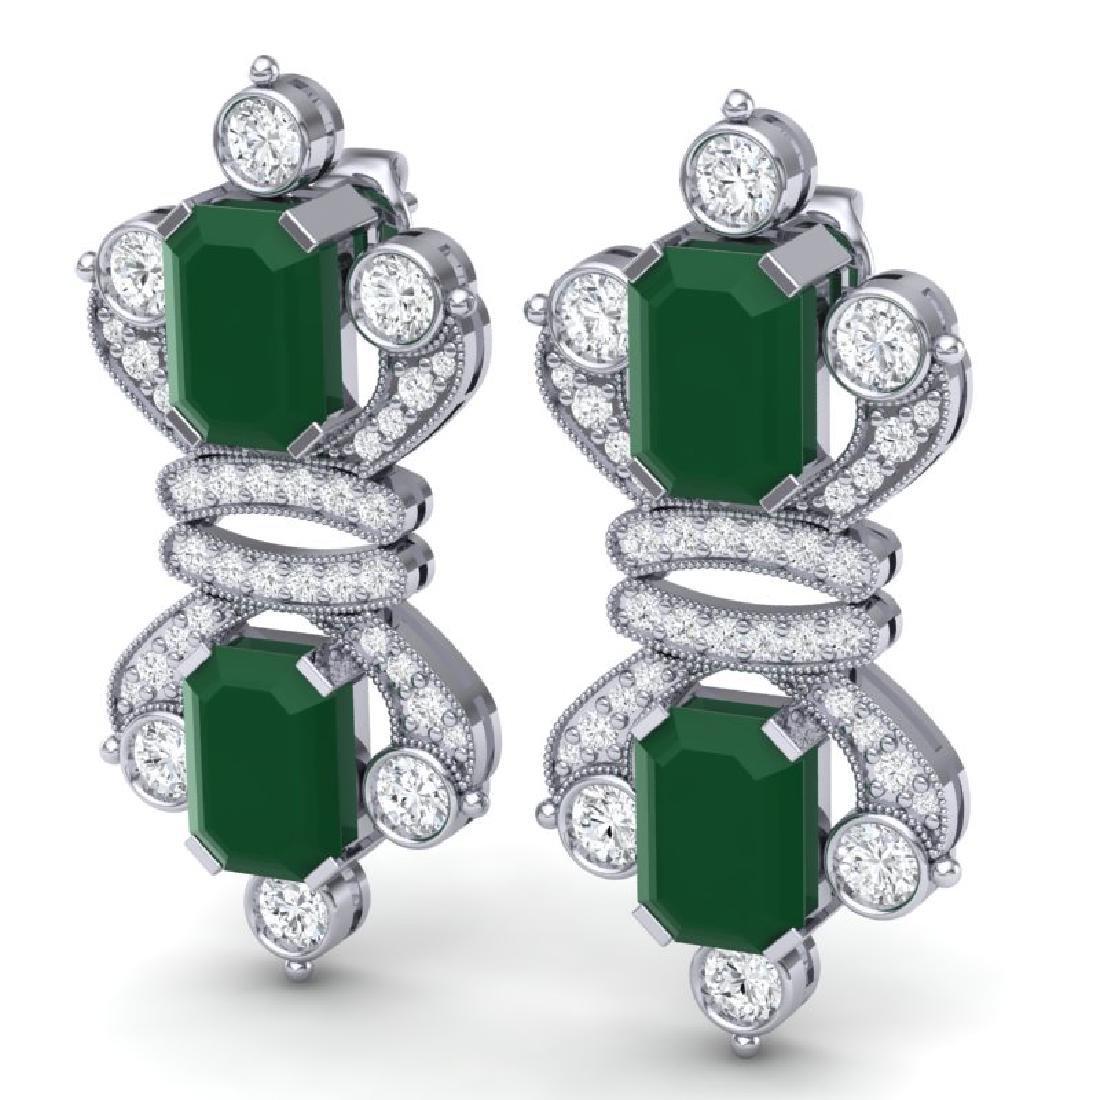 27.36 CTW Royalty Emerald & VS Diamond Earrings 18K - 2